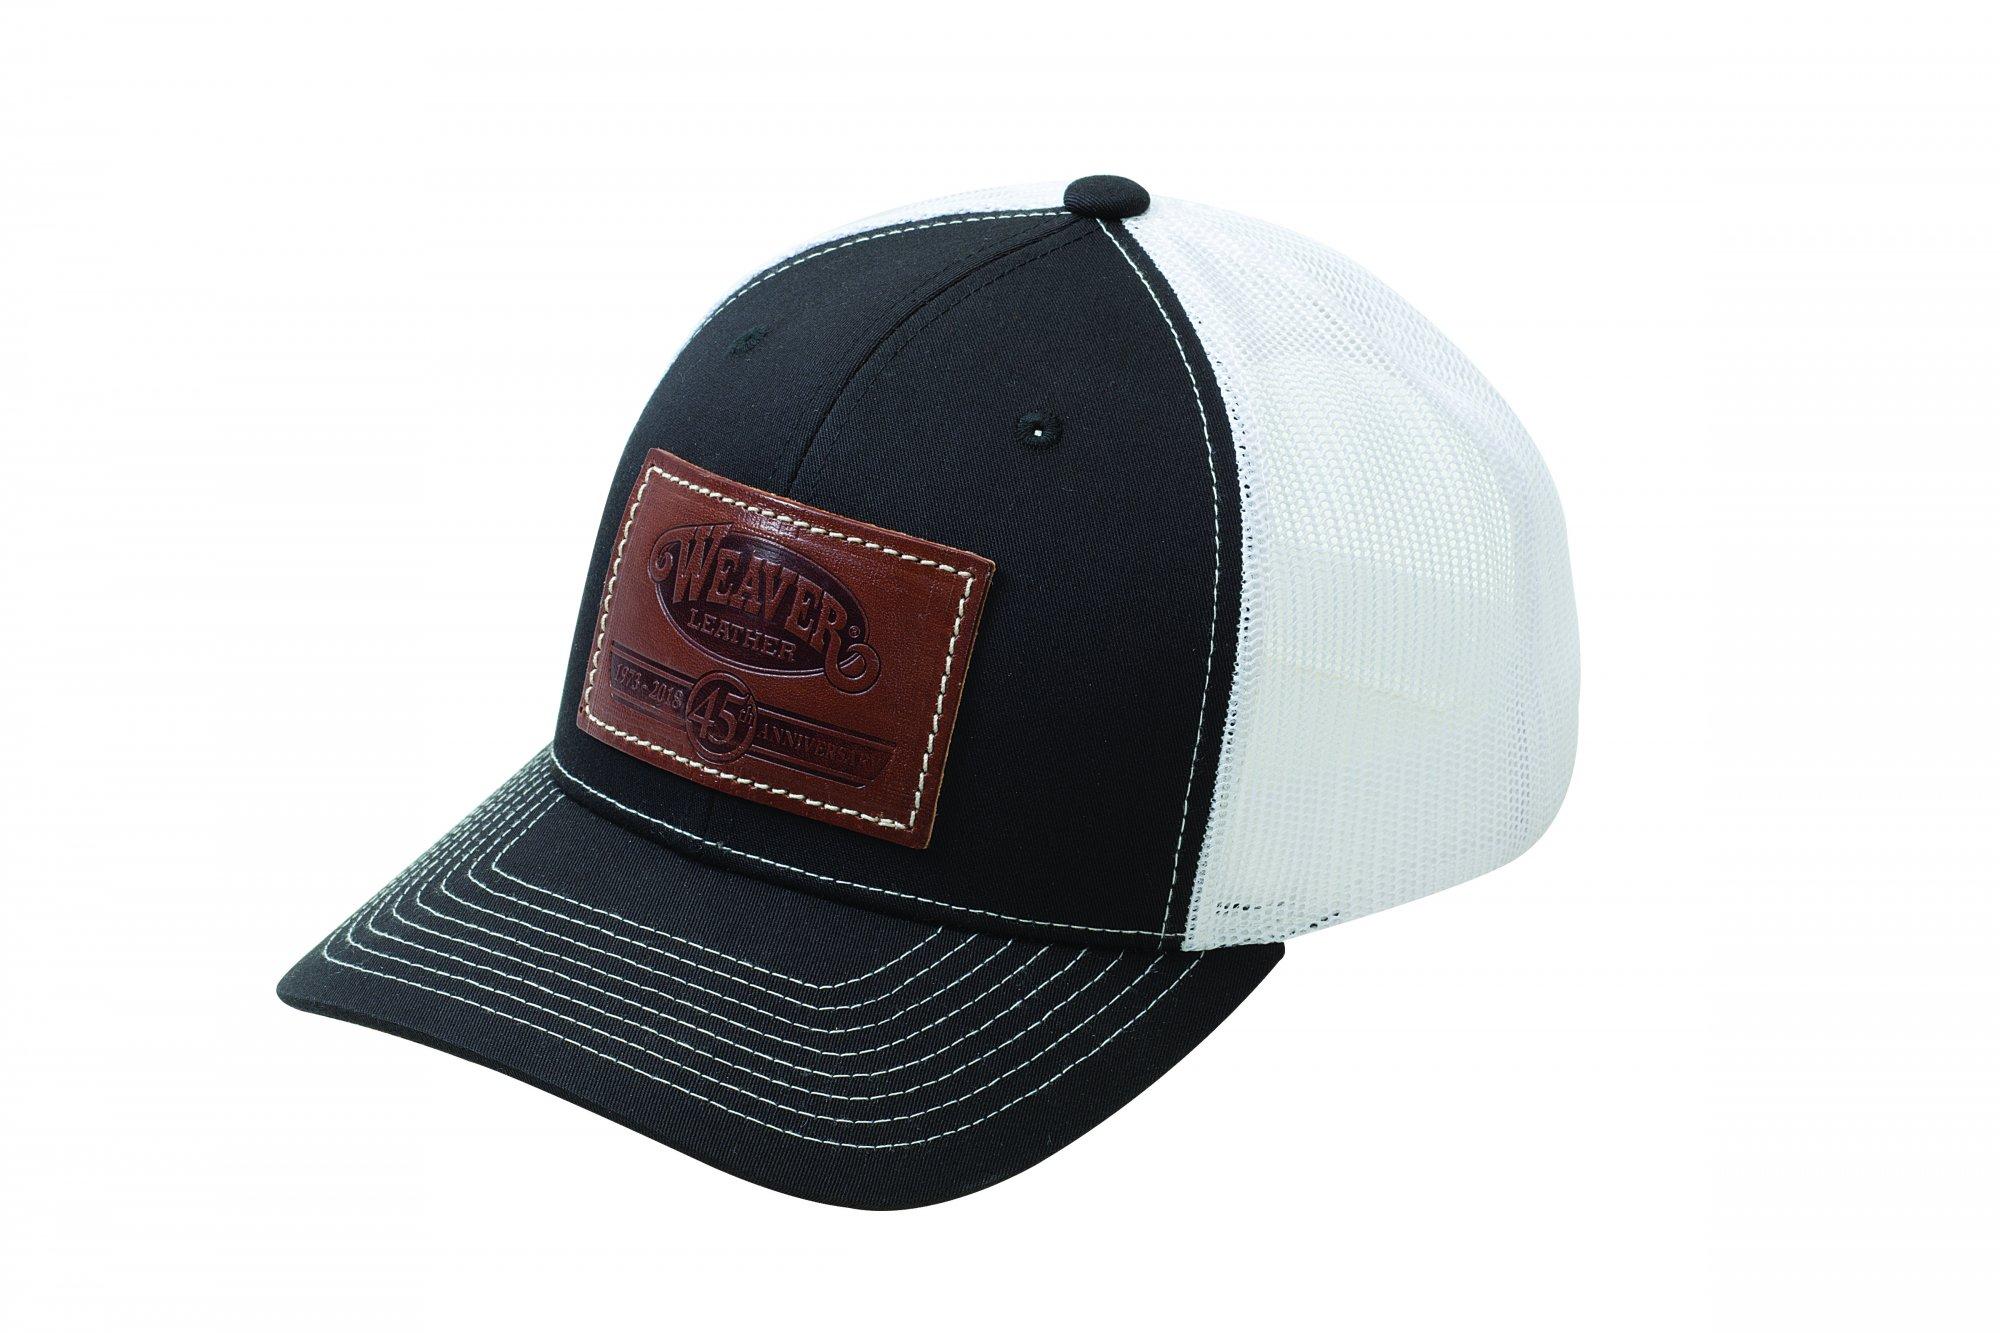 WEAVER CAP